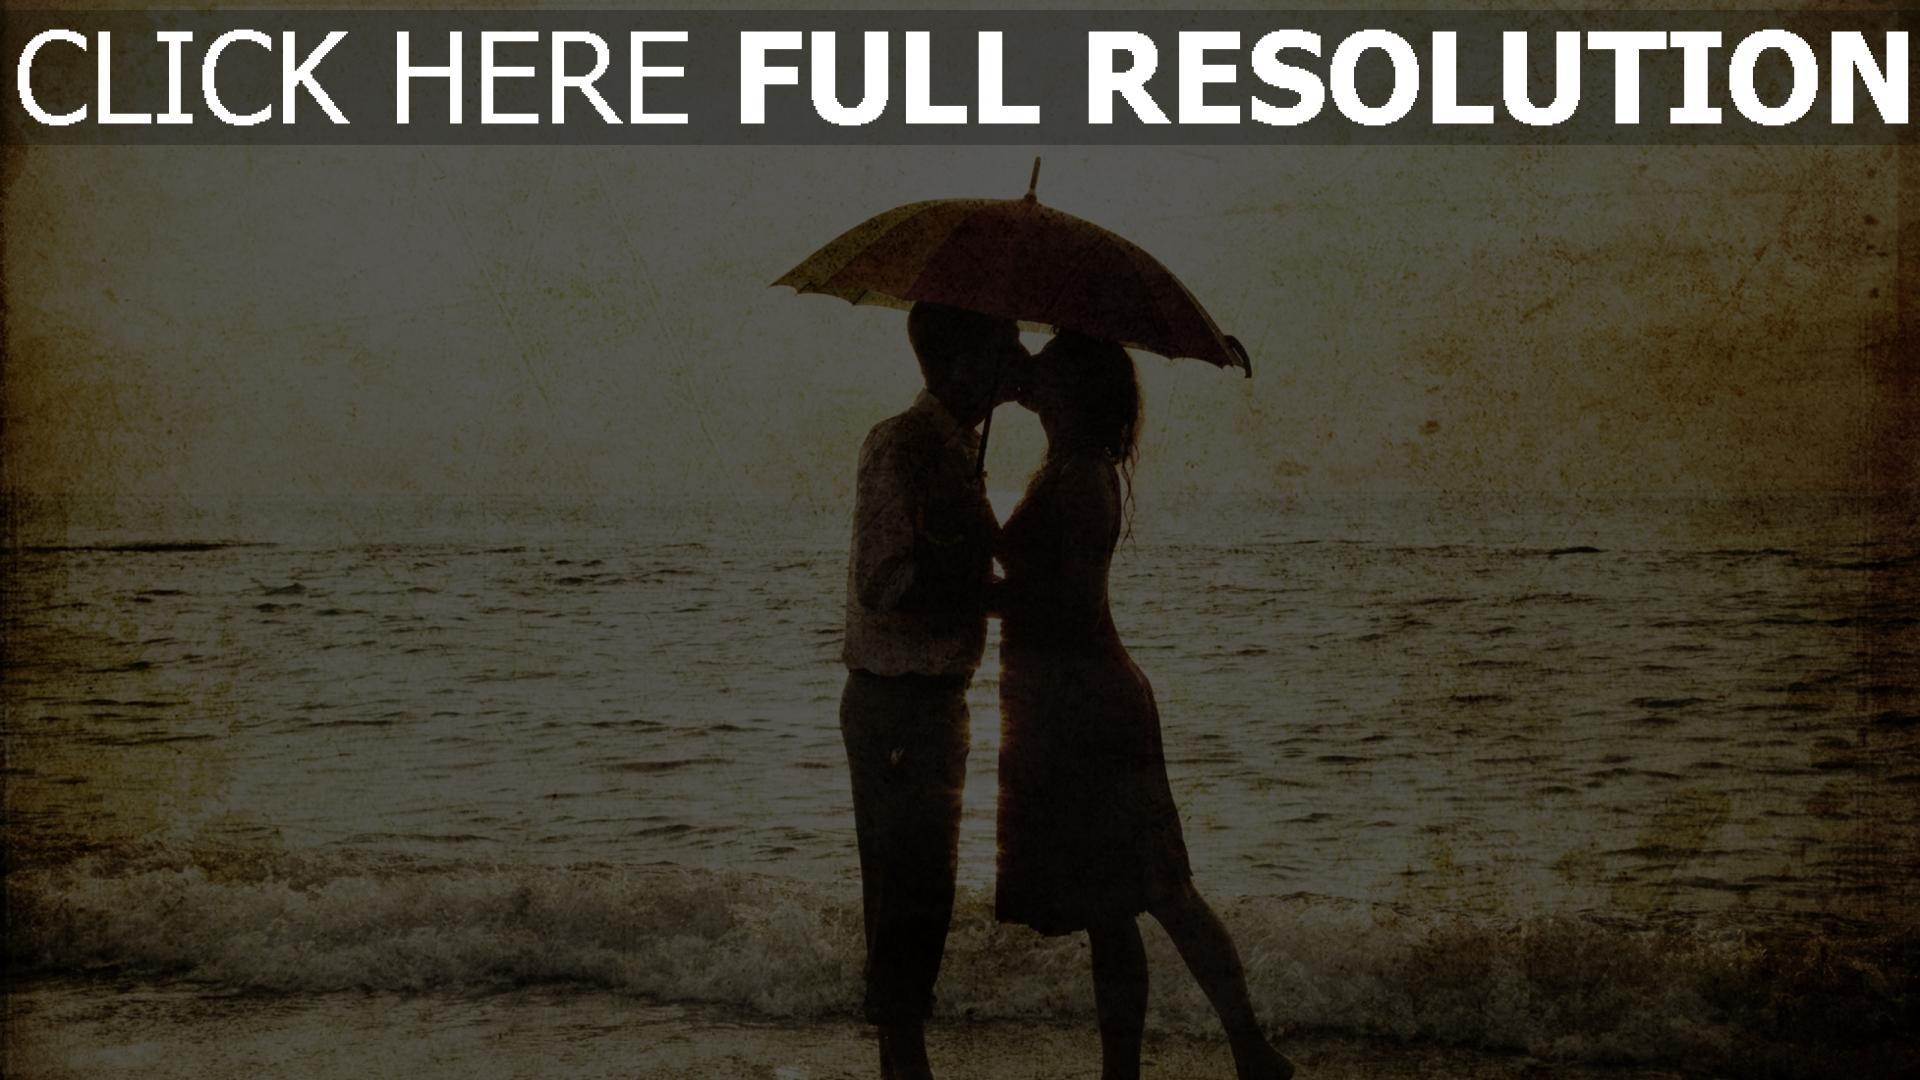 hd hintergrundbilder paar liebevollen kuss romantik meer 1920x1080